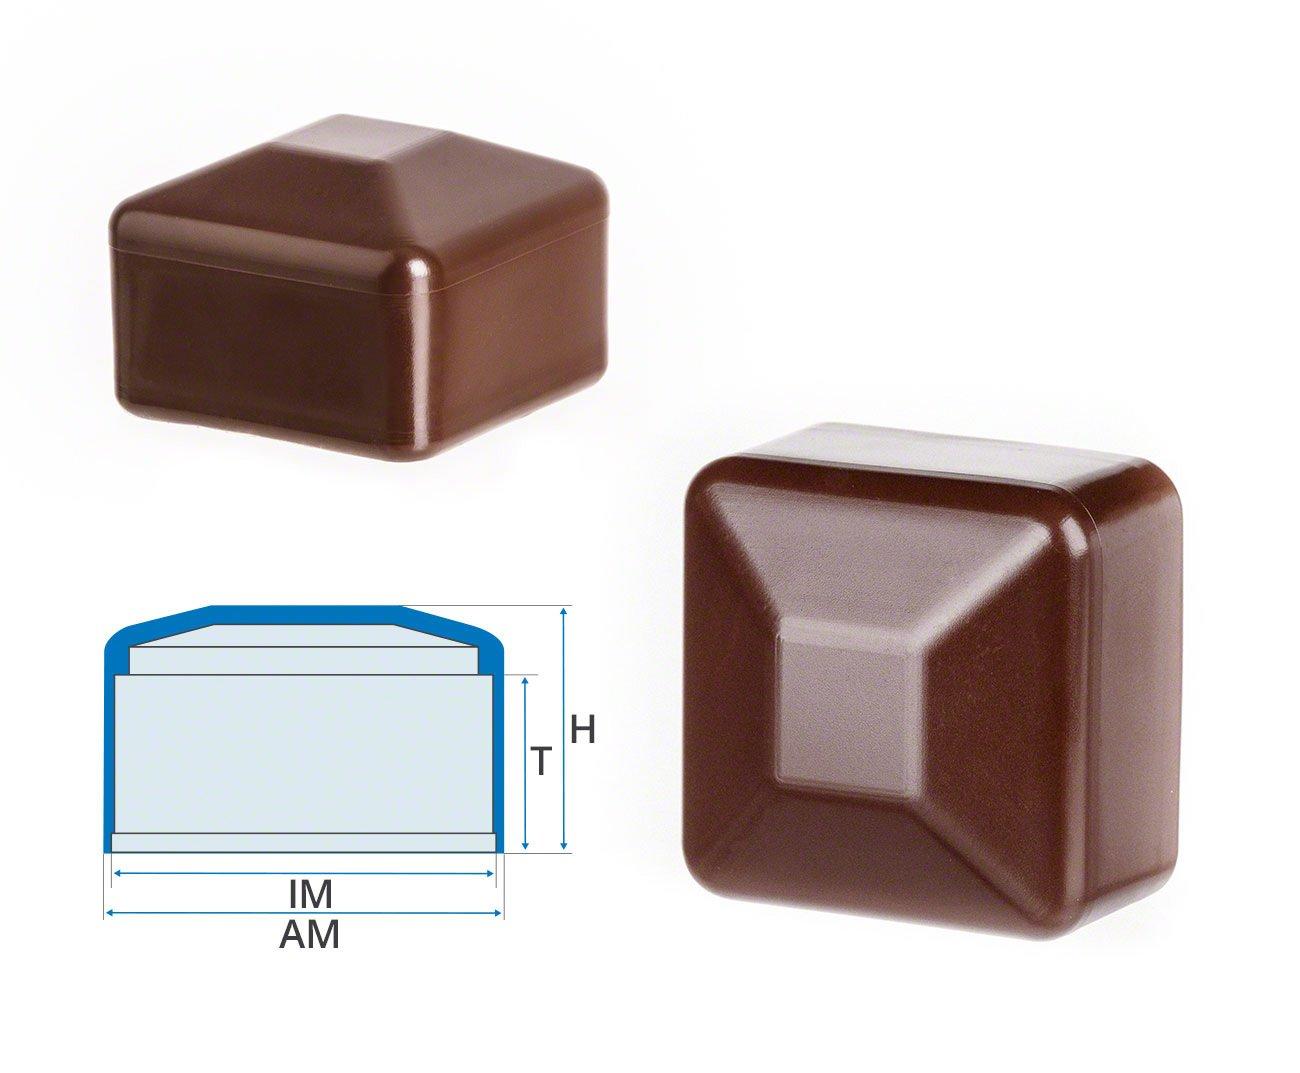 5 Stck Zaunpfahlkappe quadratisch 100x100 mm Braun Kunststoff Pfostenkappen Abdeckappen